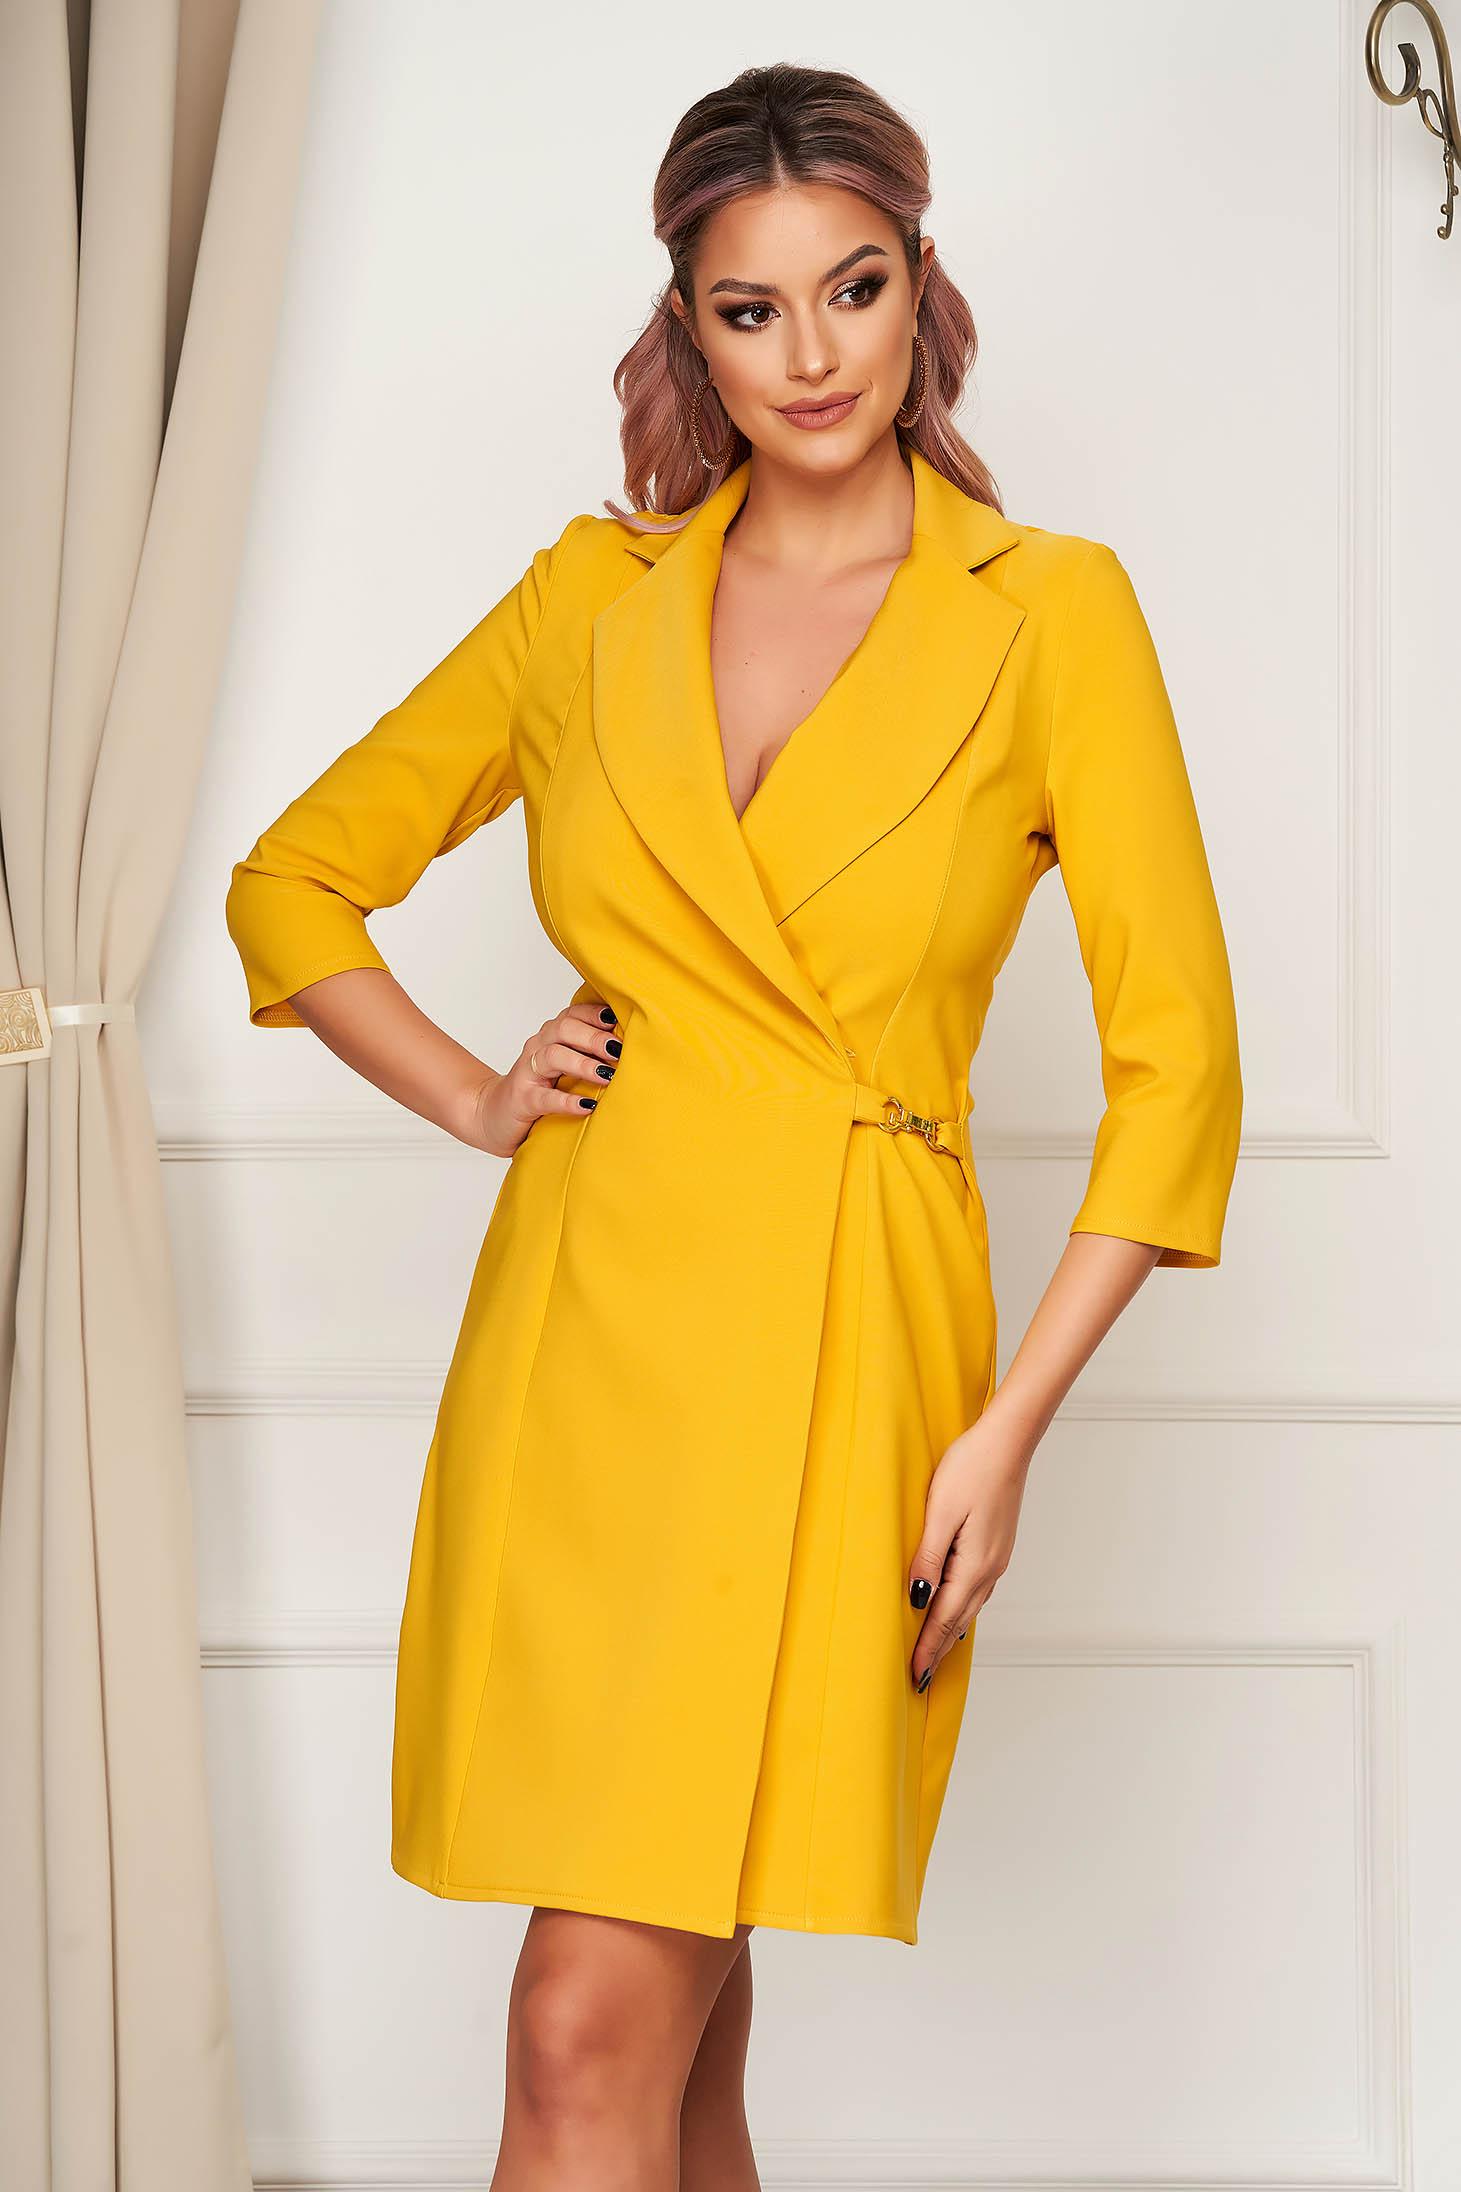 Elegant short cut pencil yellow dress wrap around cloth thin fabric